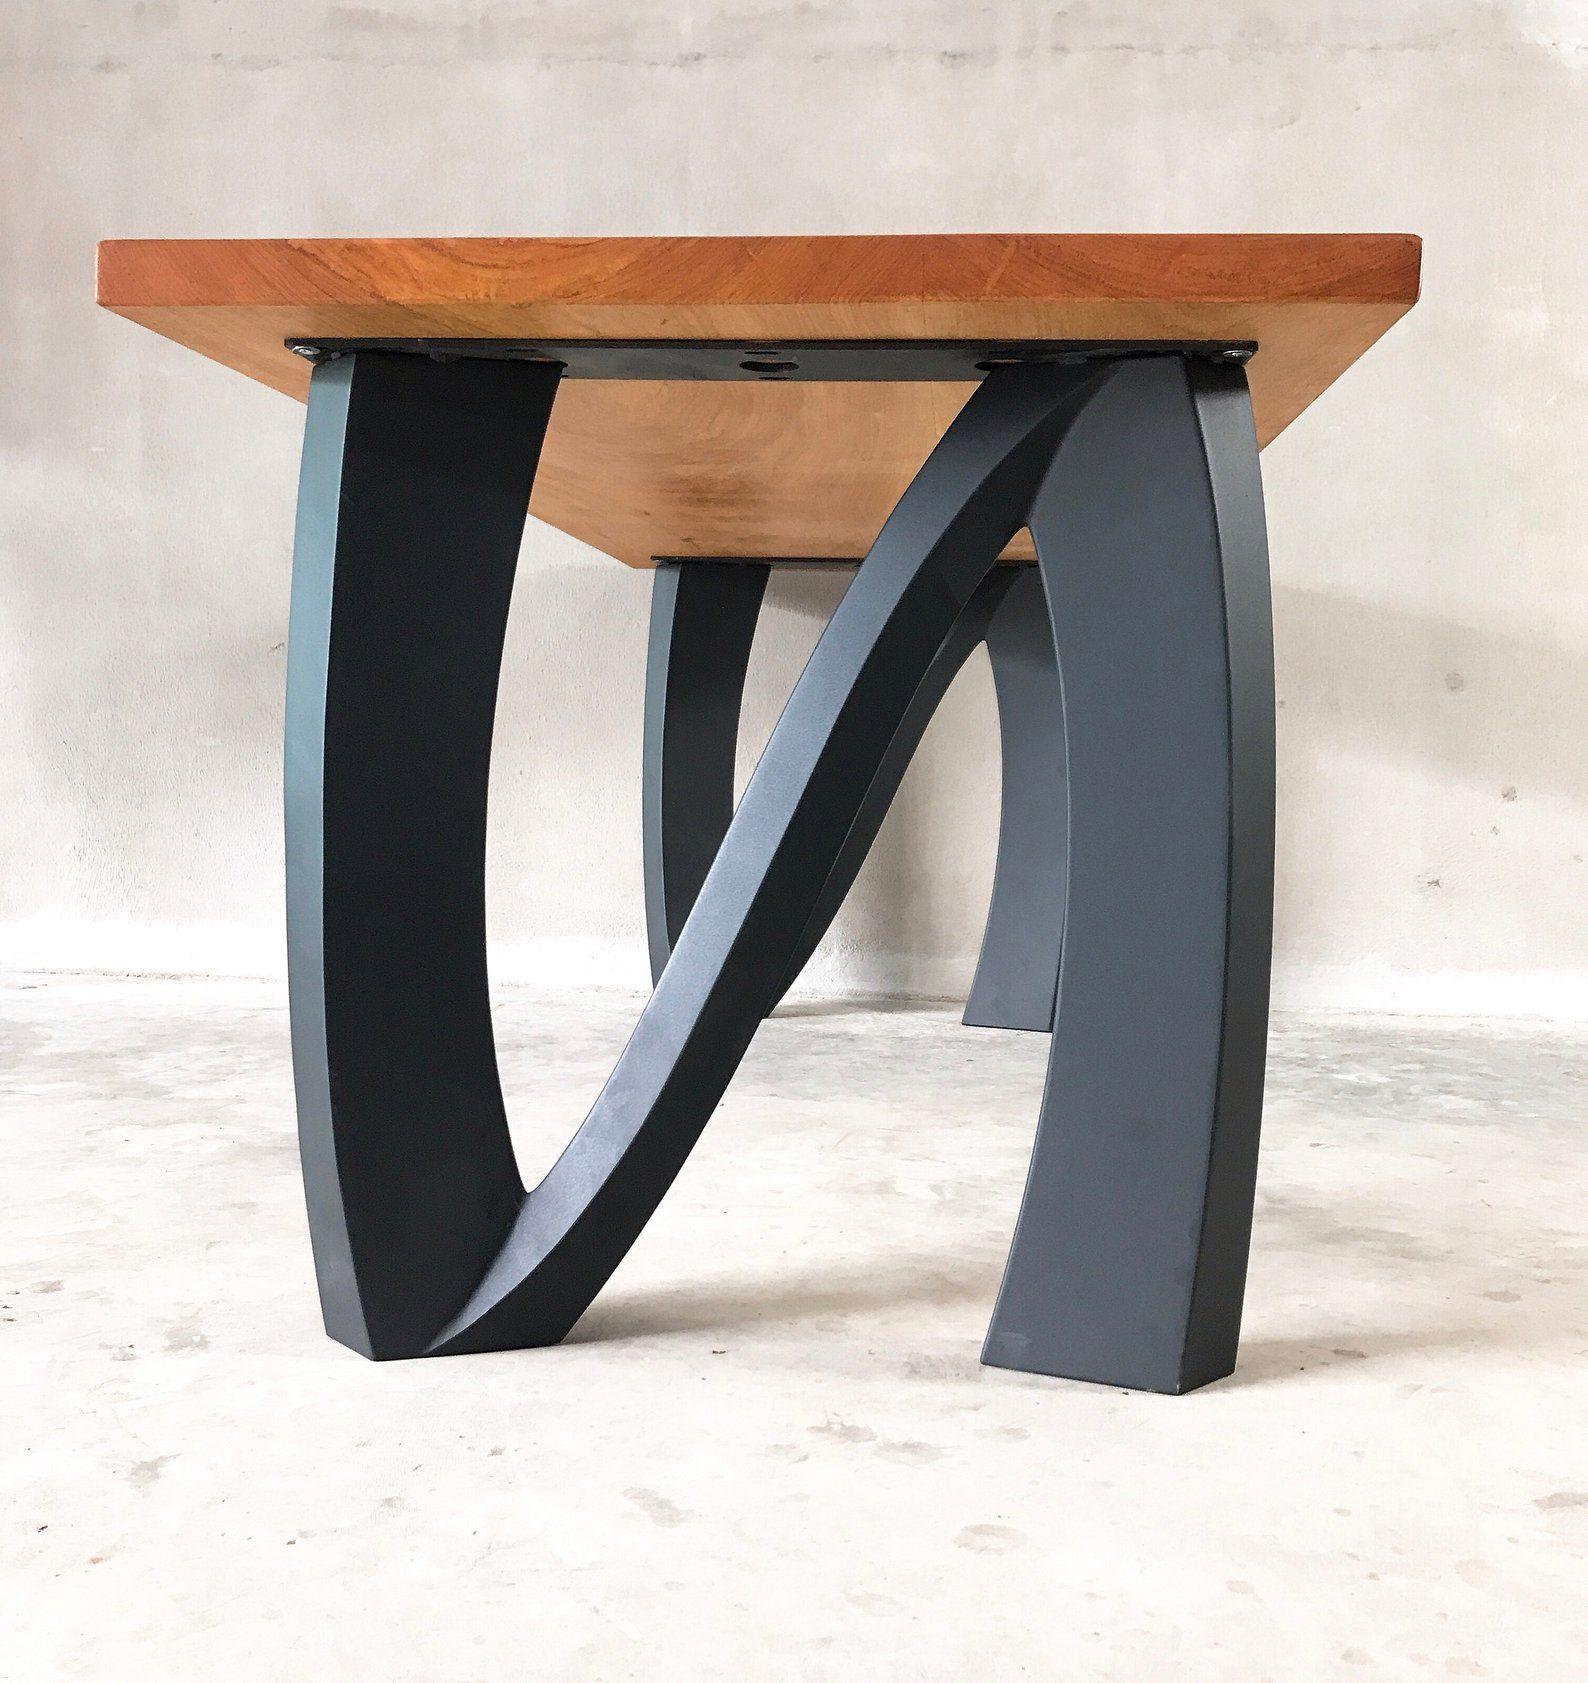 407 Norah Metal Table Legs 28 Bench Legs 16 Etsy Metal Table Legs Metal Table Metal Table Base